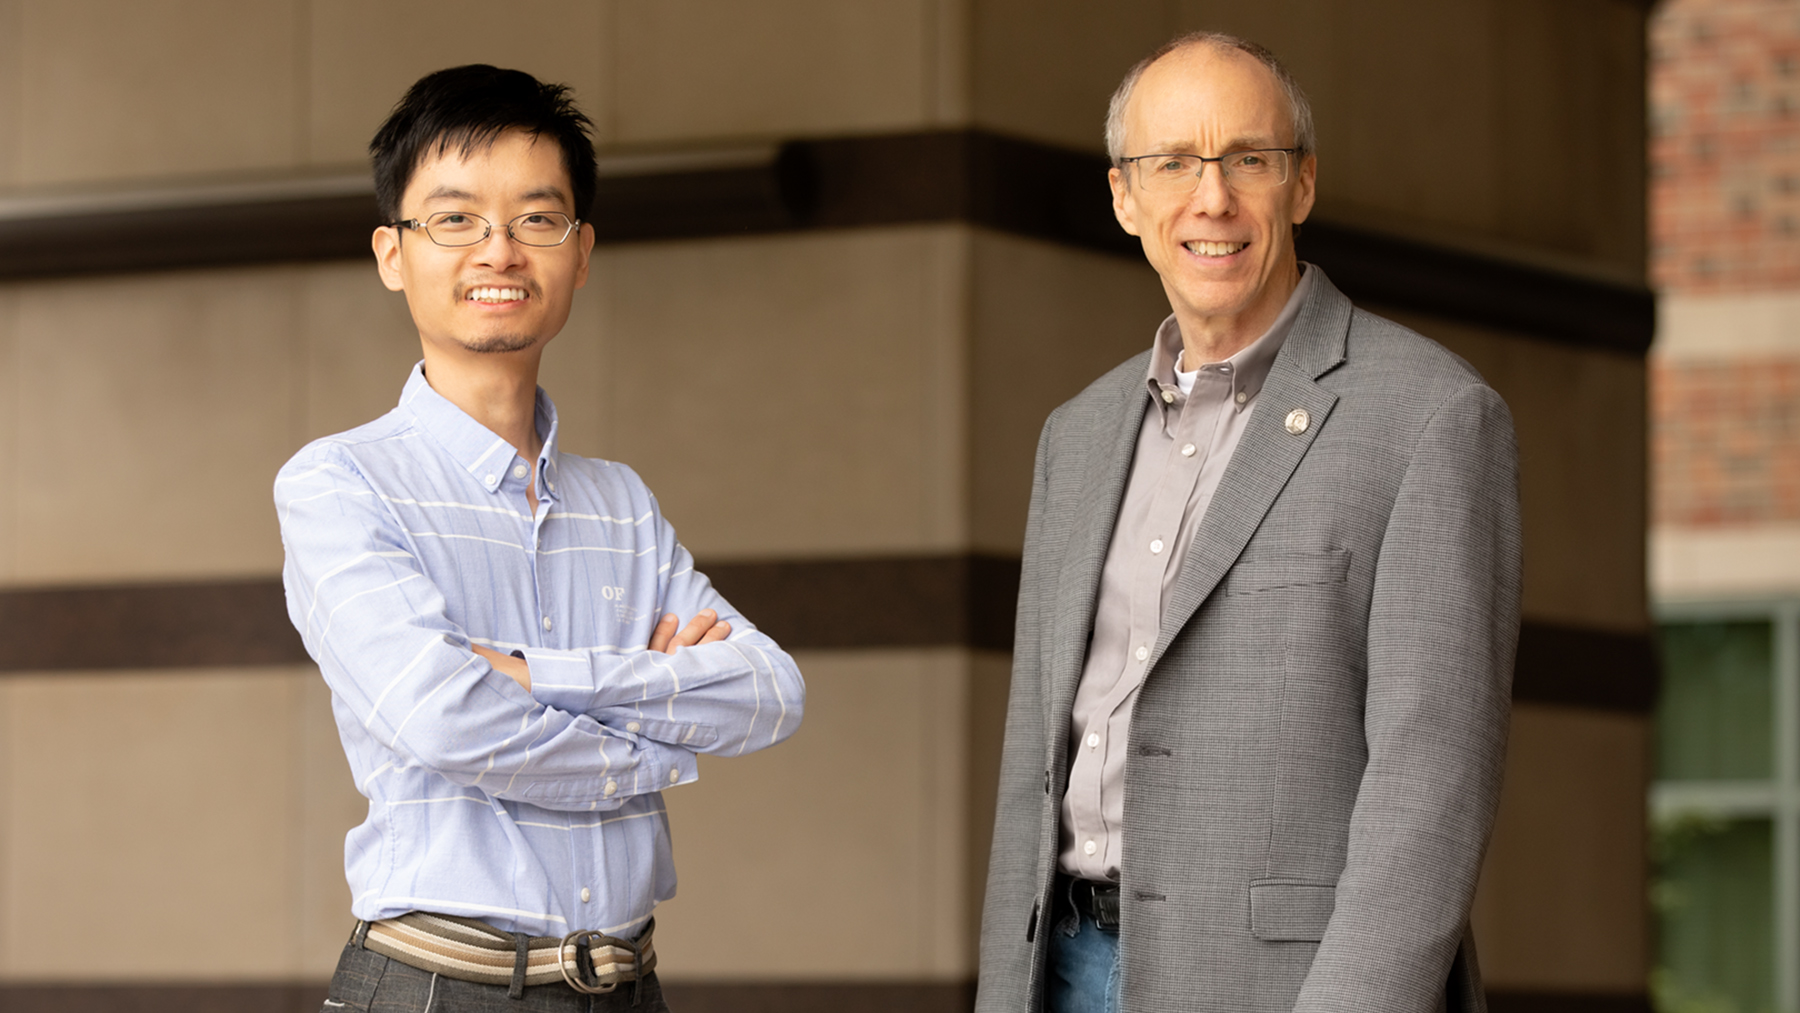 Illinois researchers Yue Liu and Jeffrey Moore